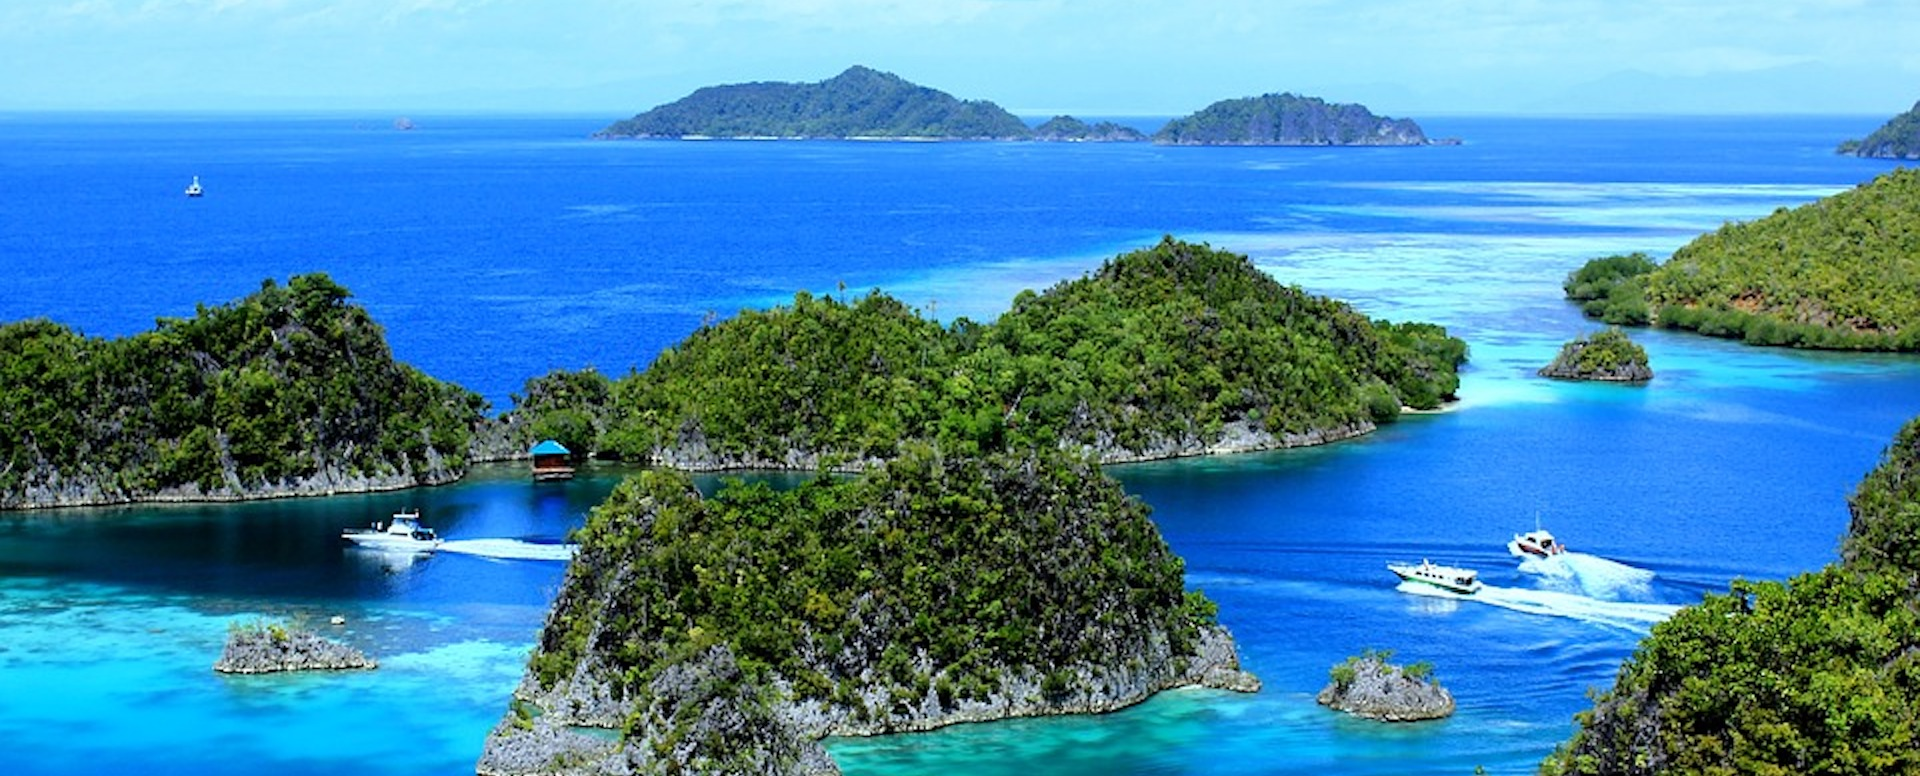 Papouasie - Indonésie